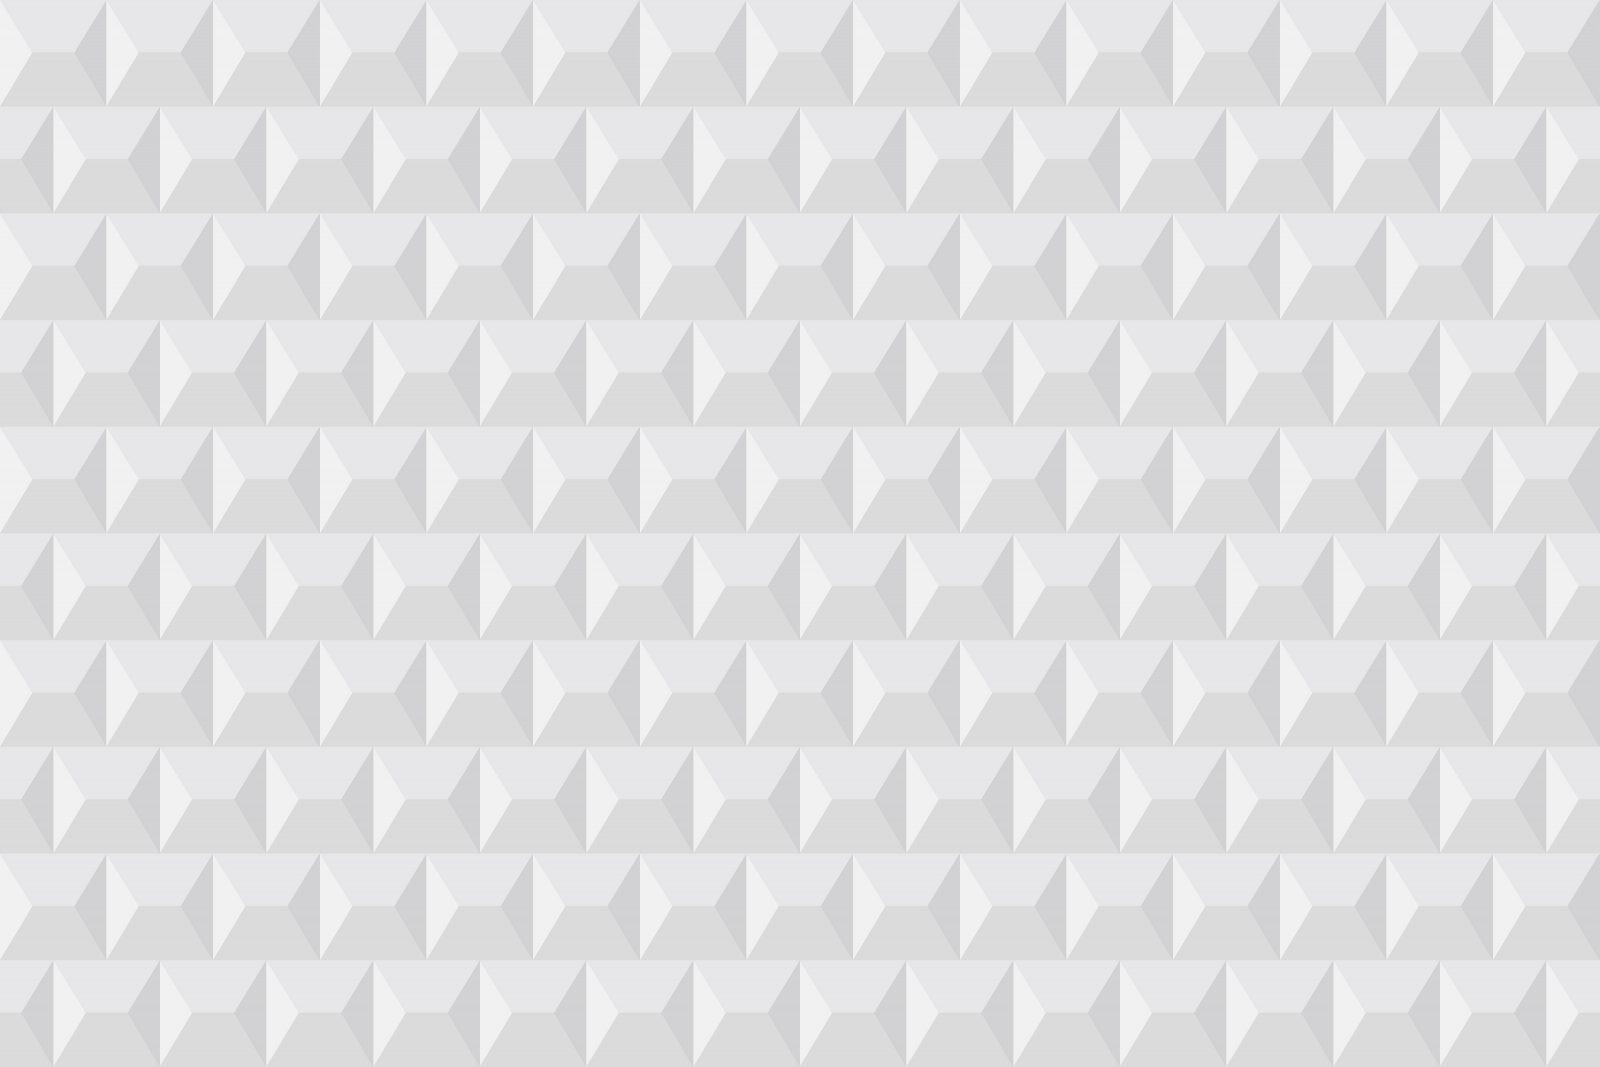 Geometric white texture seamless pattern